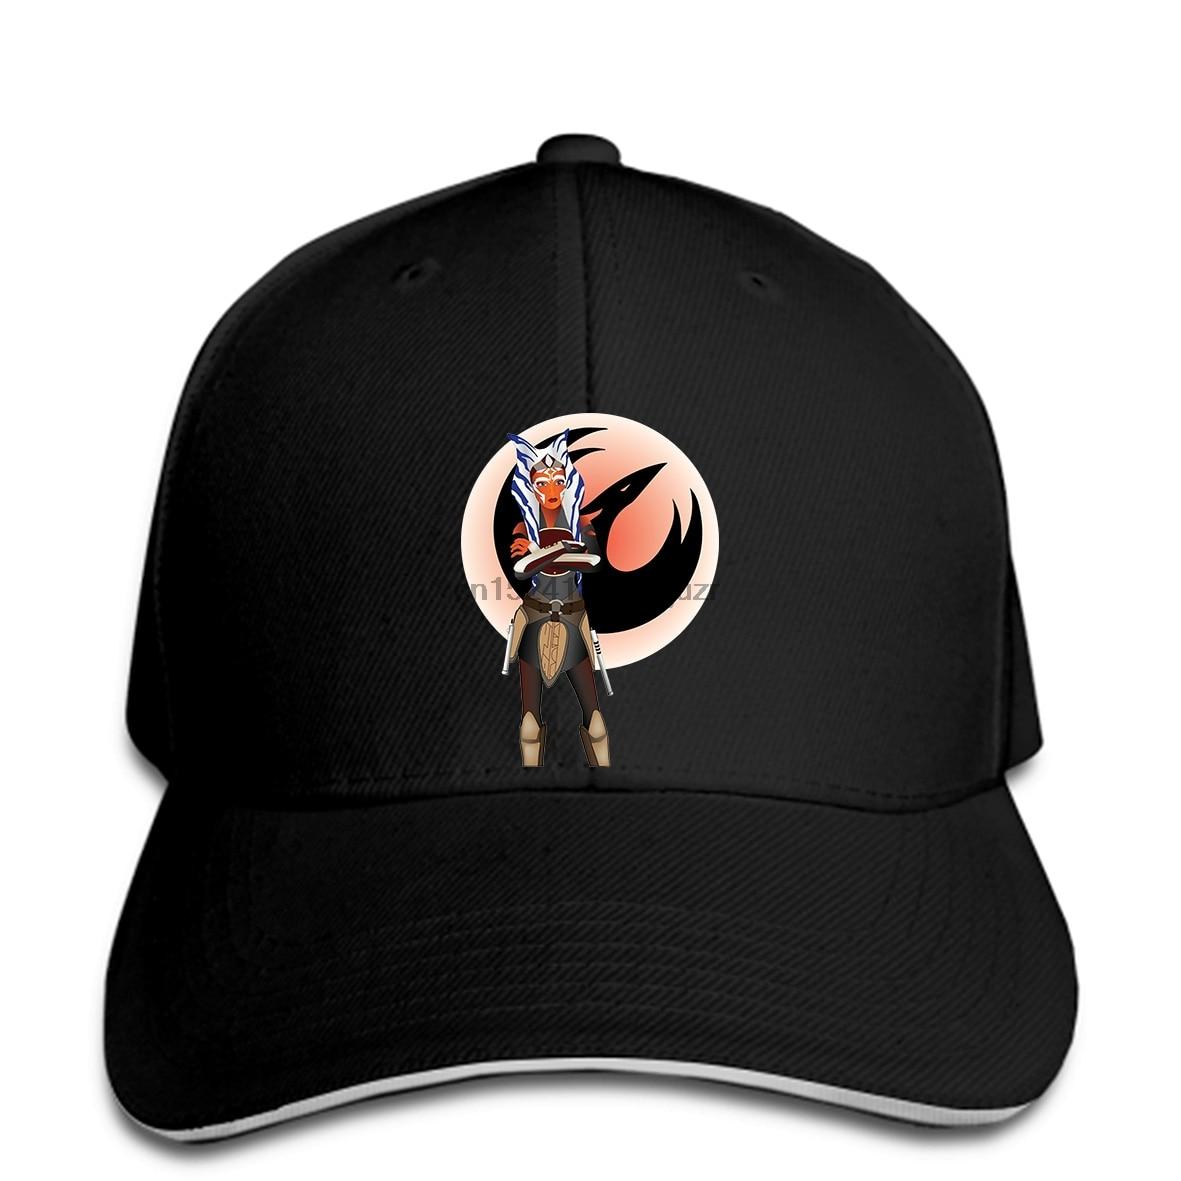 Gorras de béisbol de hip hop, gorras de moda geniales Ahsoka Tano estampados personalizados snapback